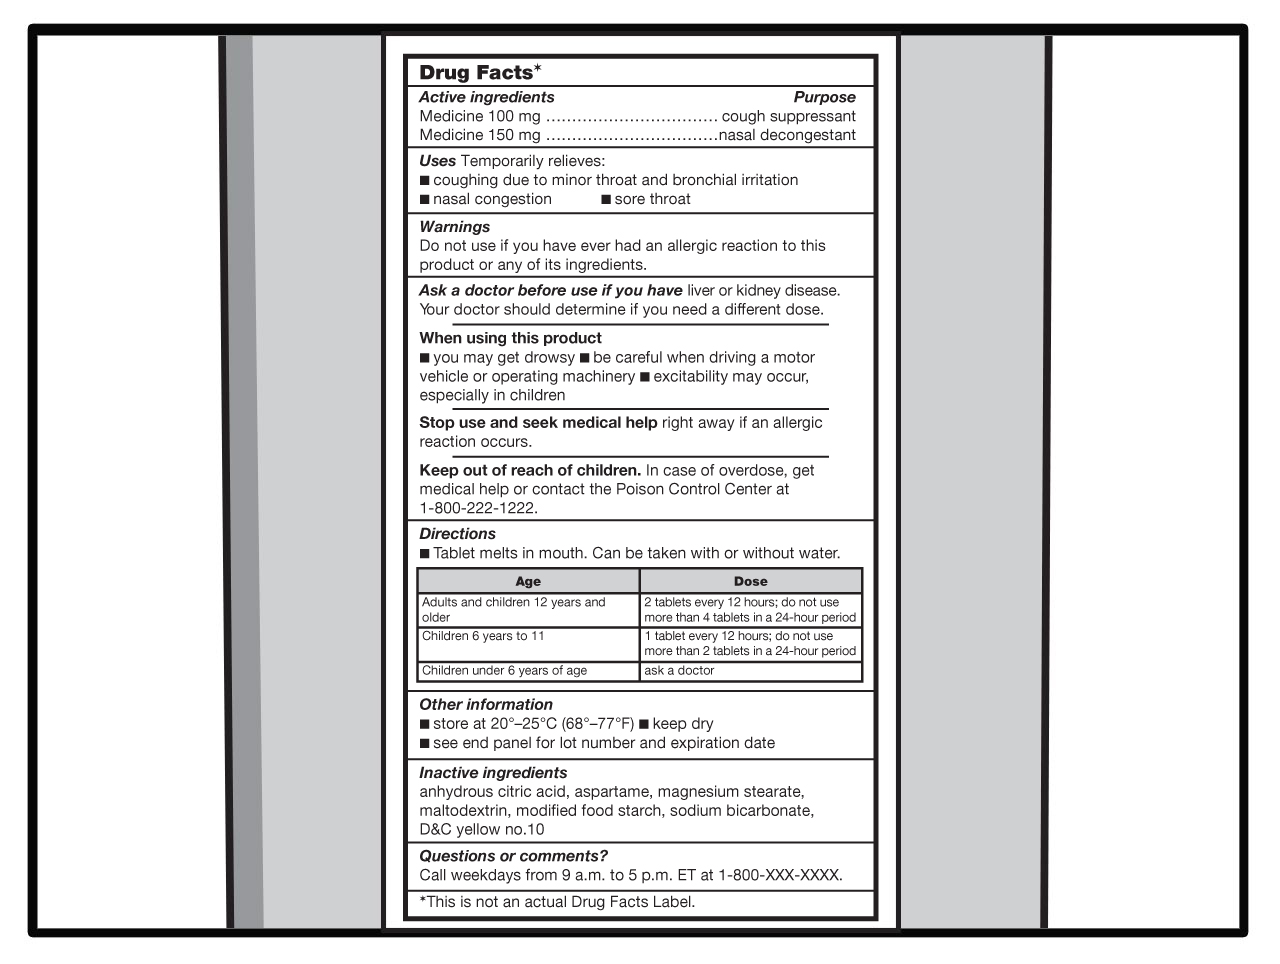 Worksheet Ideas Lesson Reading And Understanding The Drug Worksheets Samples